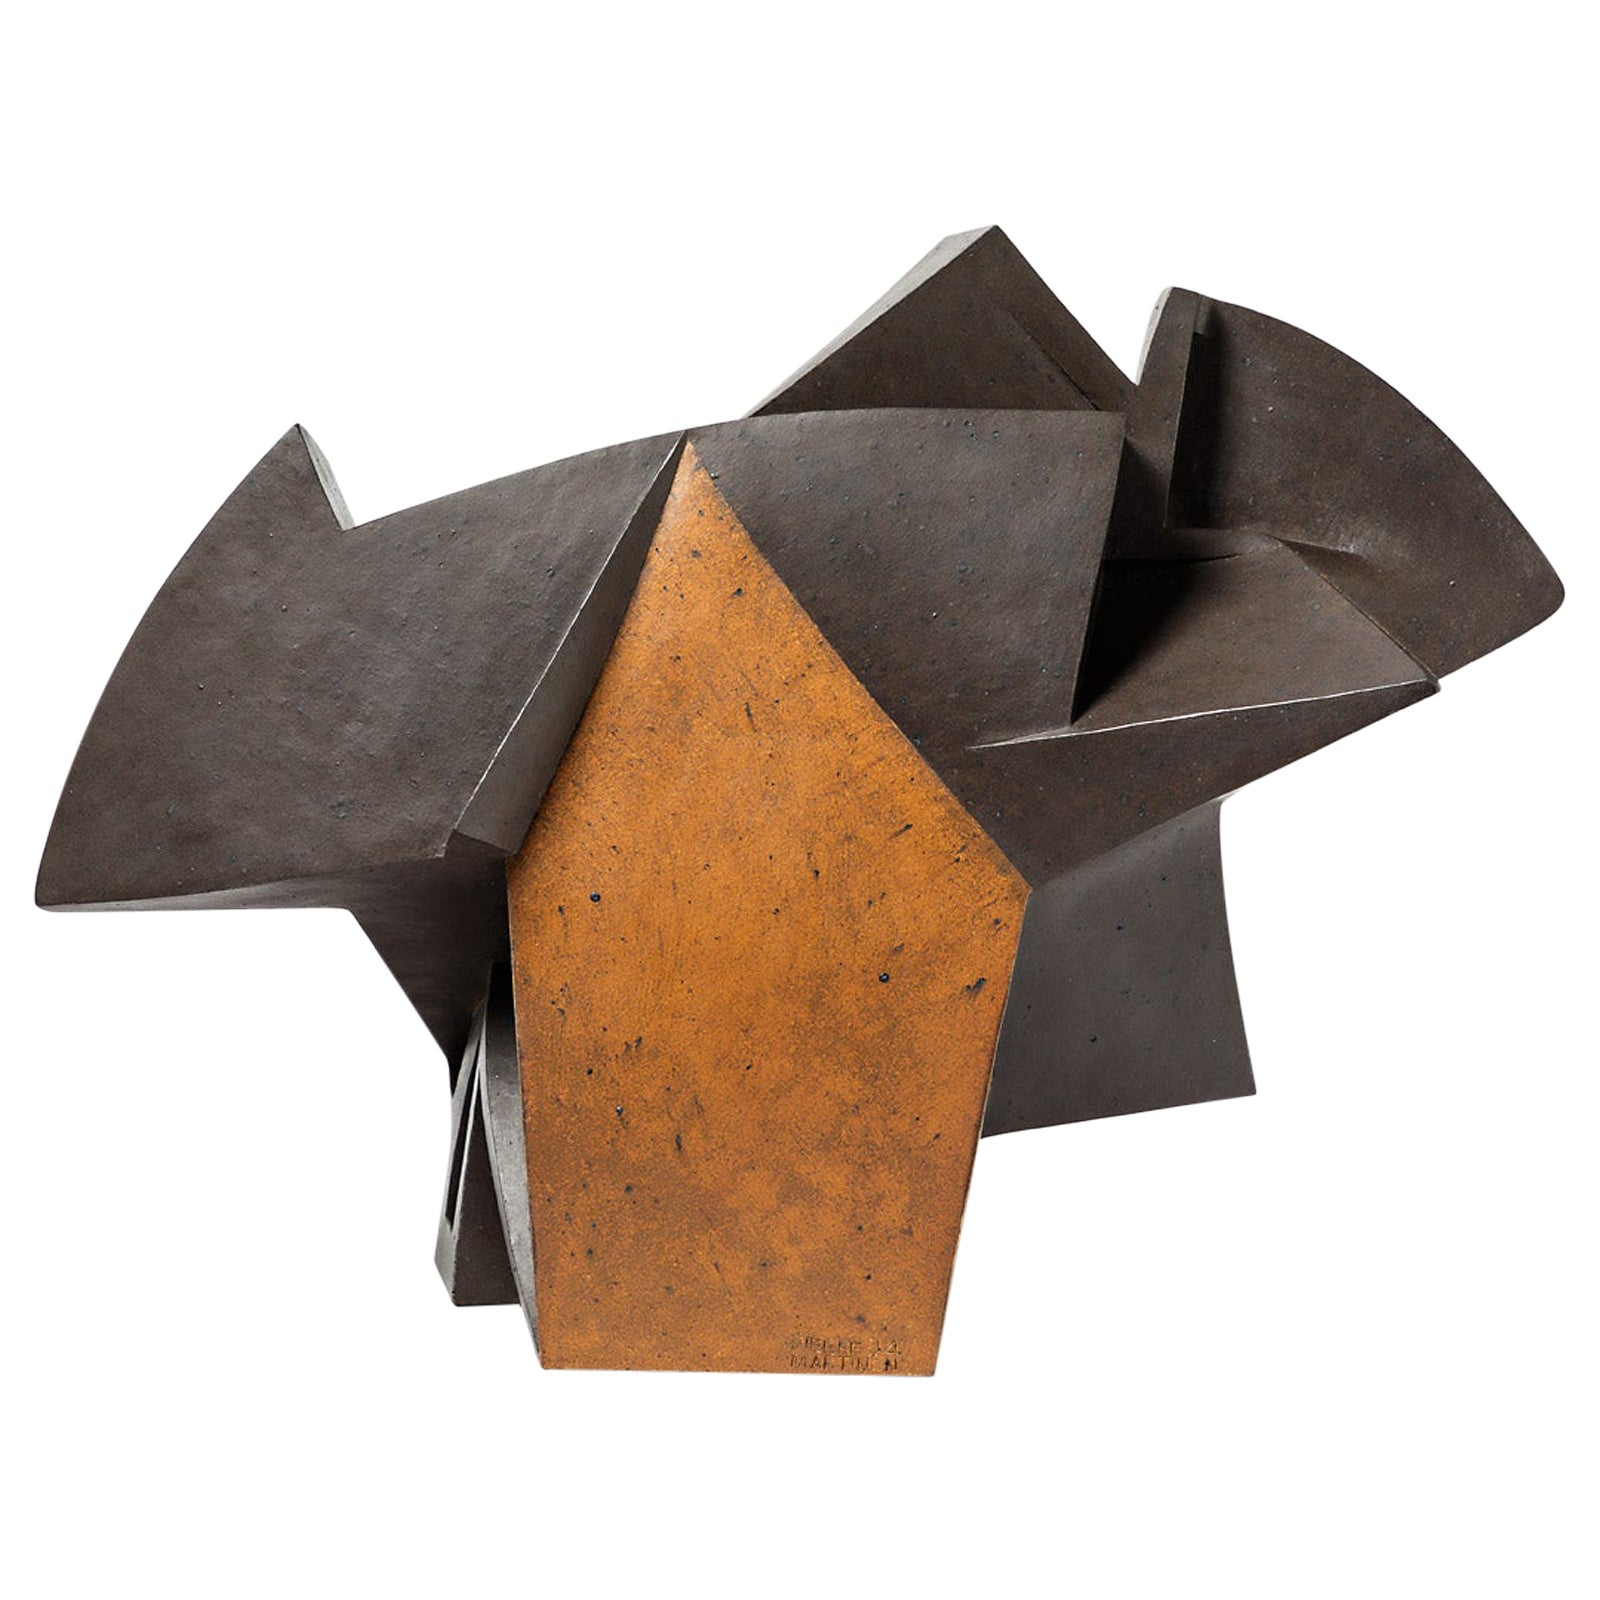 "Sculpture Entitled ""Bascule"" by Pierre Martinon, circa 1994"